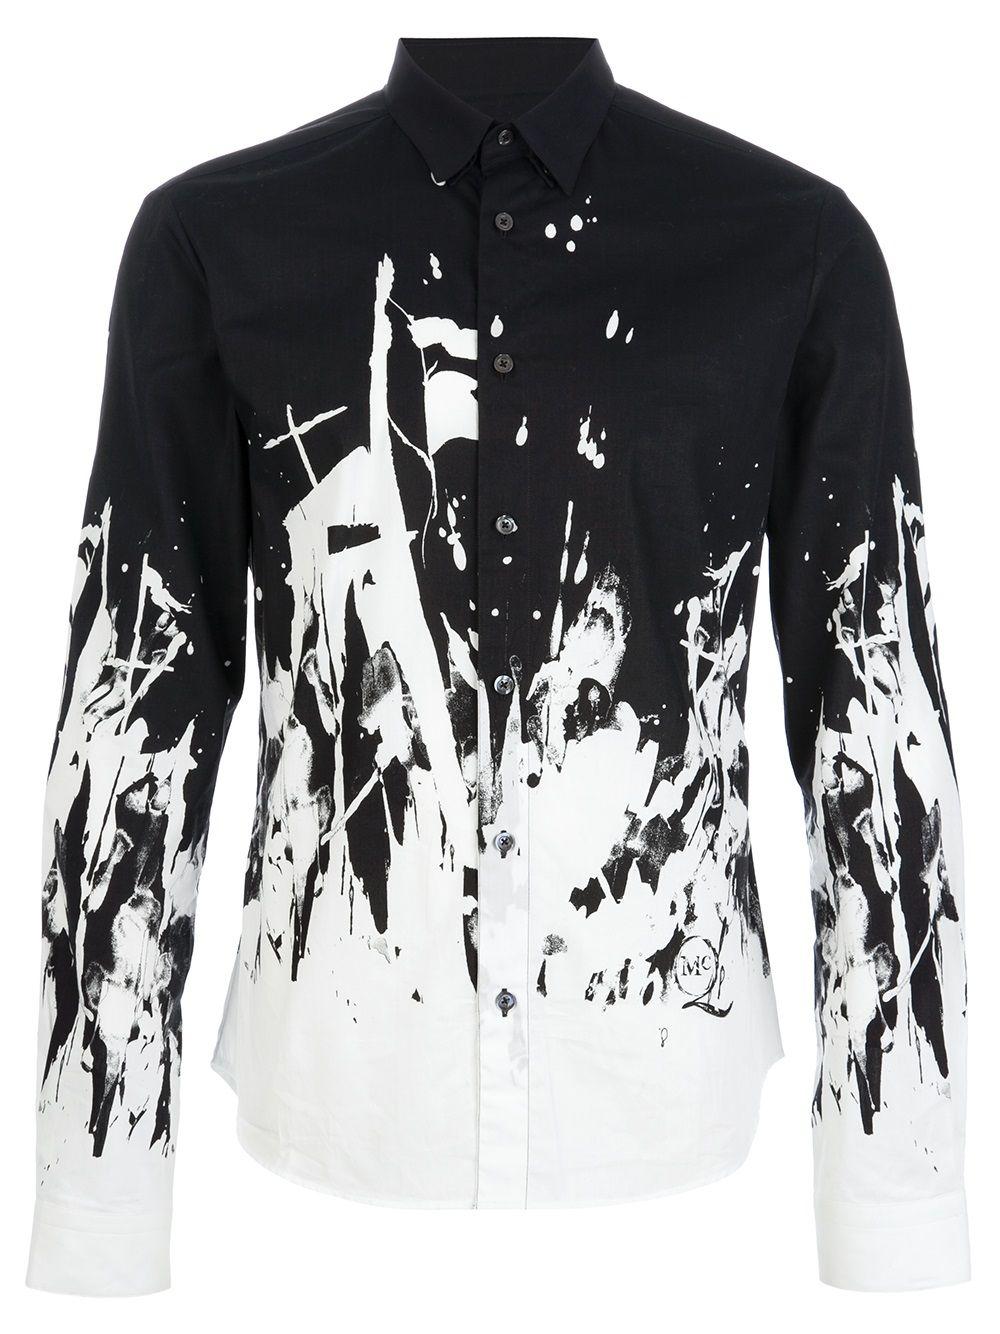 6264a9d8cb Mcq By Alexander Mcqueen Paint Splatter Shirt in White for Men (black) |  Lyst